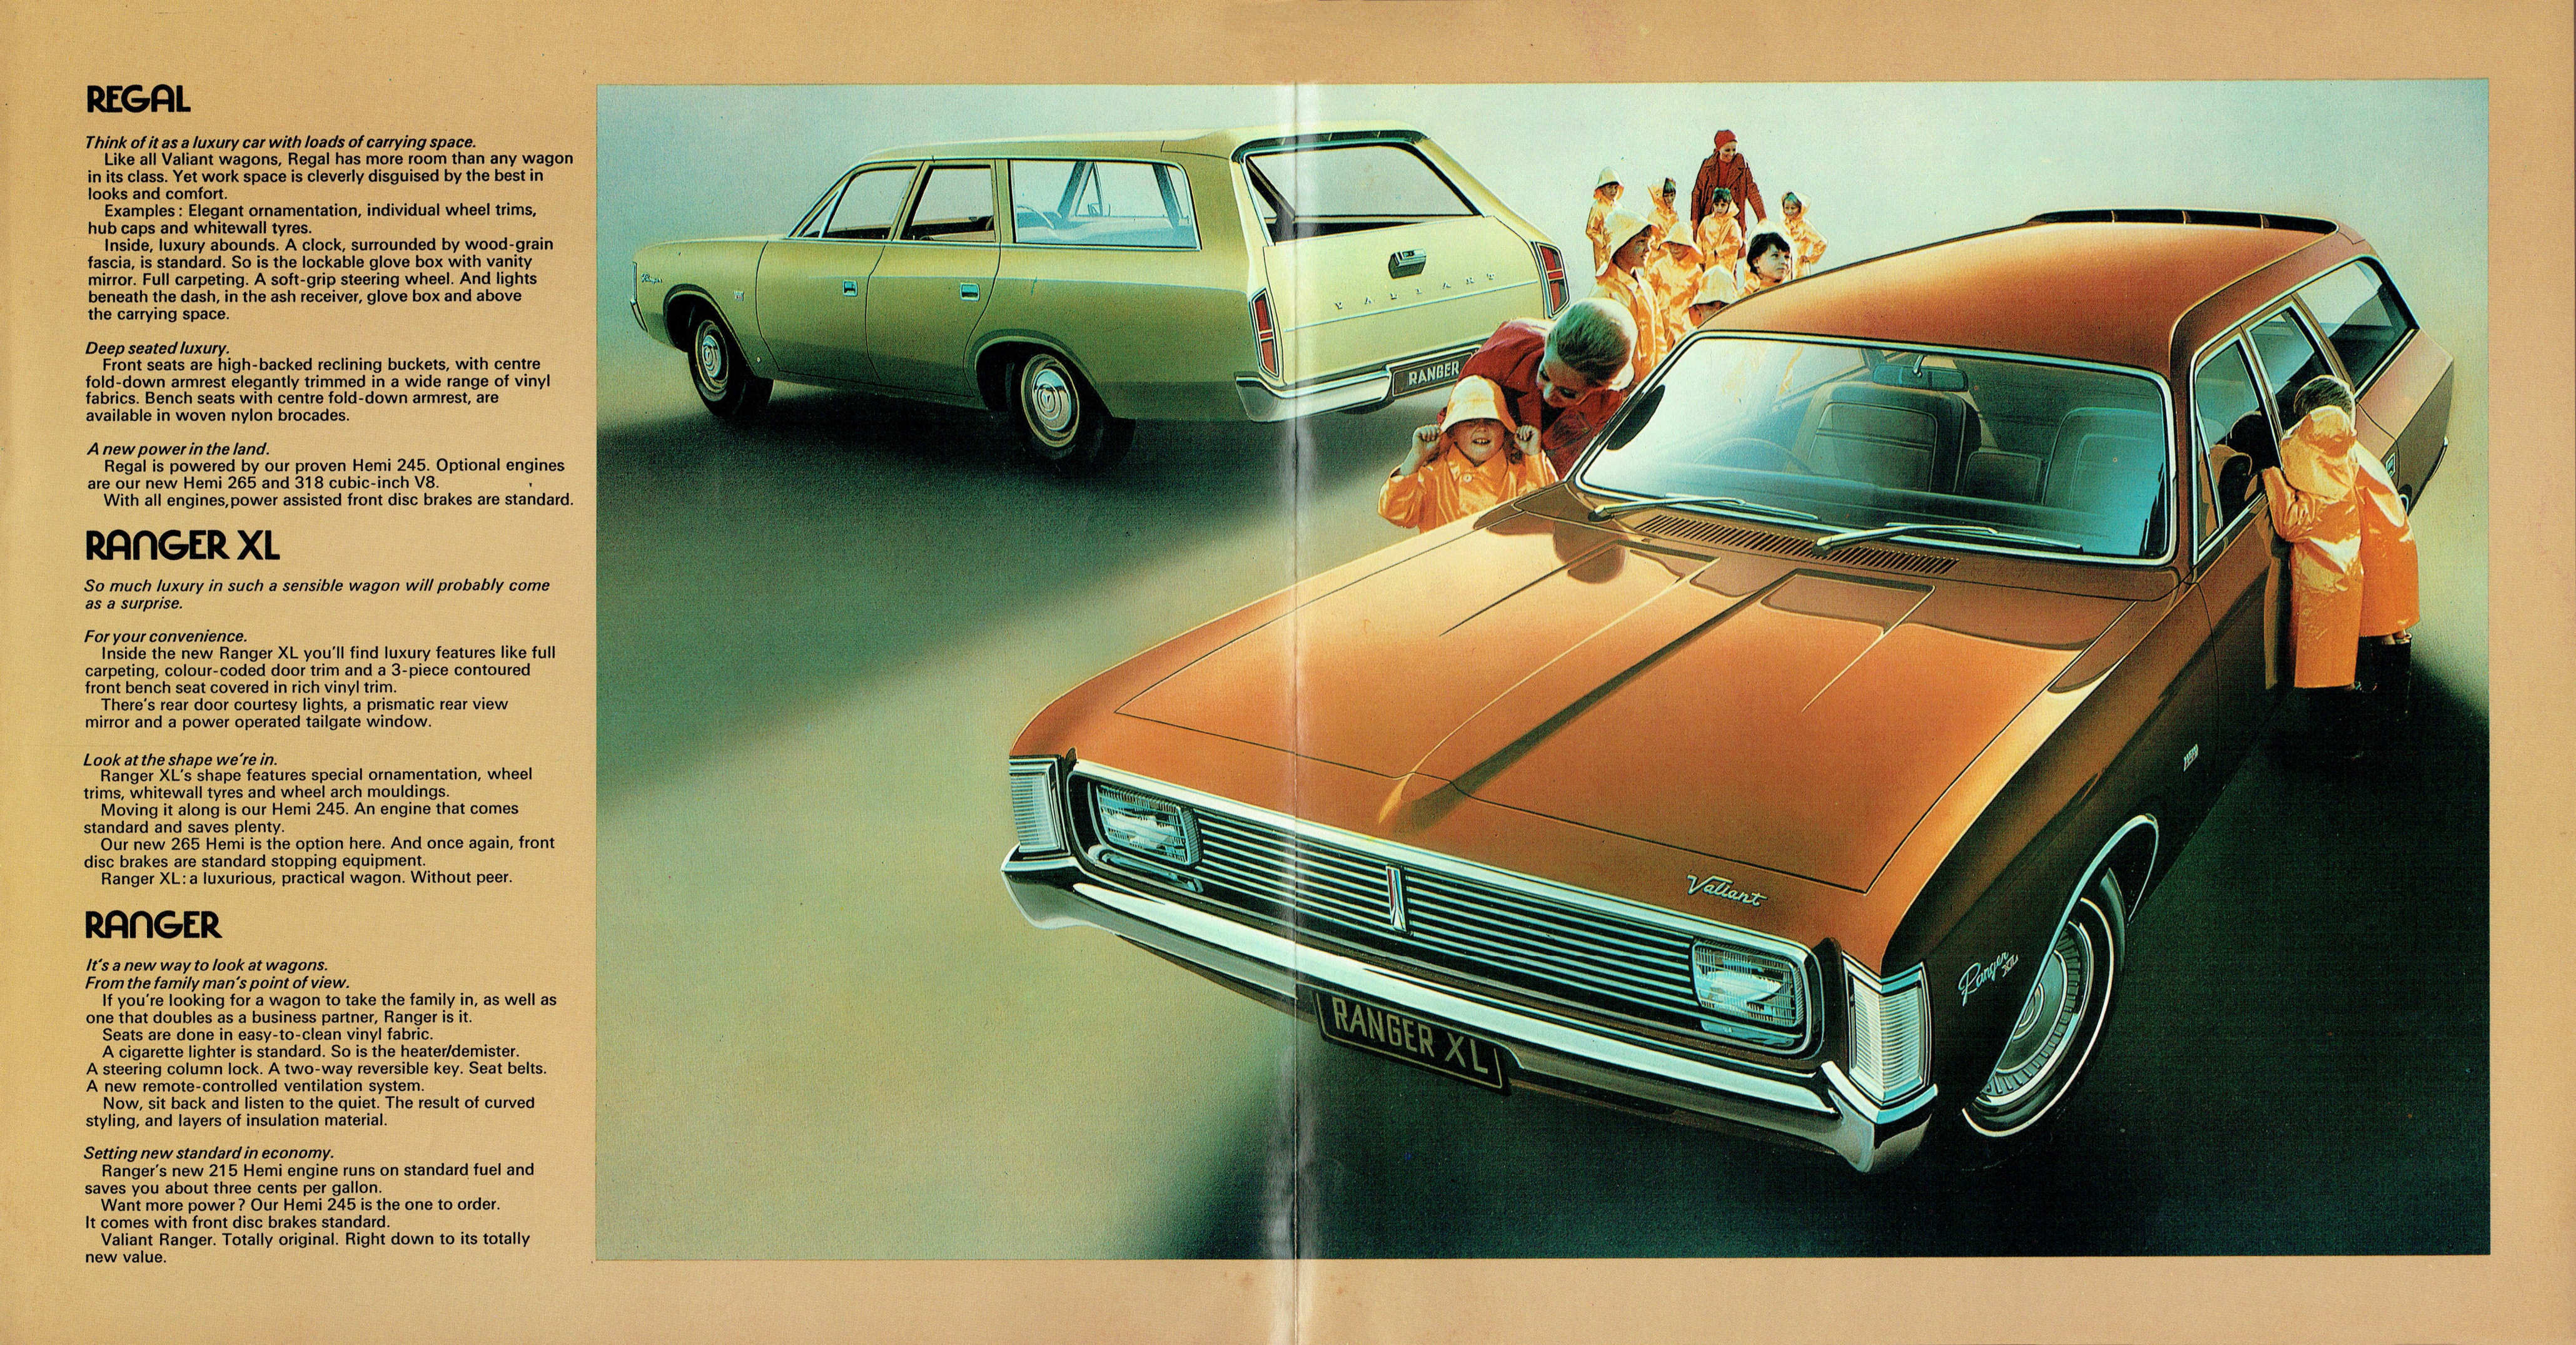 1971 Chrysler VH Valiant Wagon Brochure